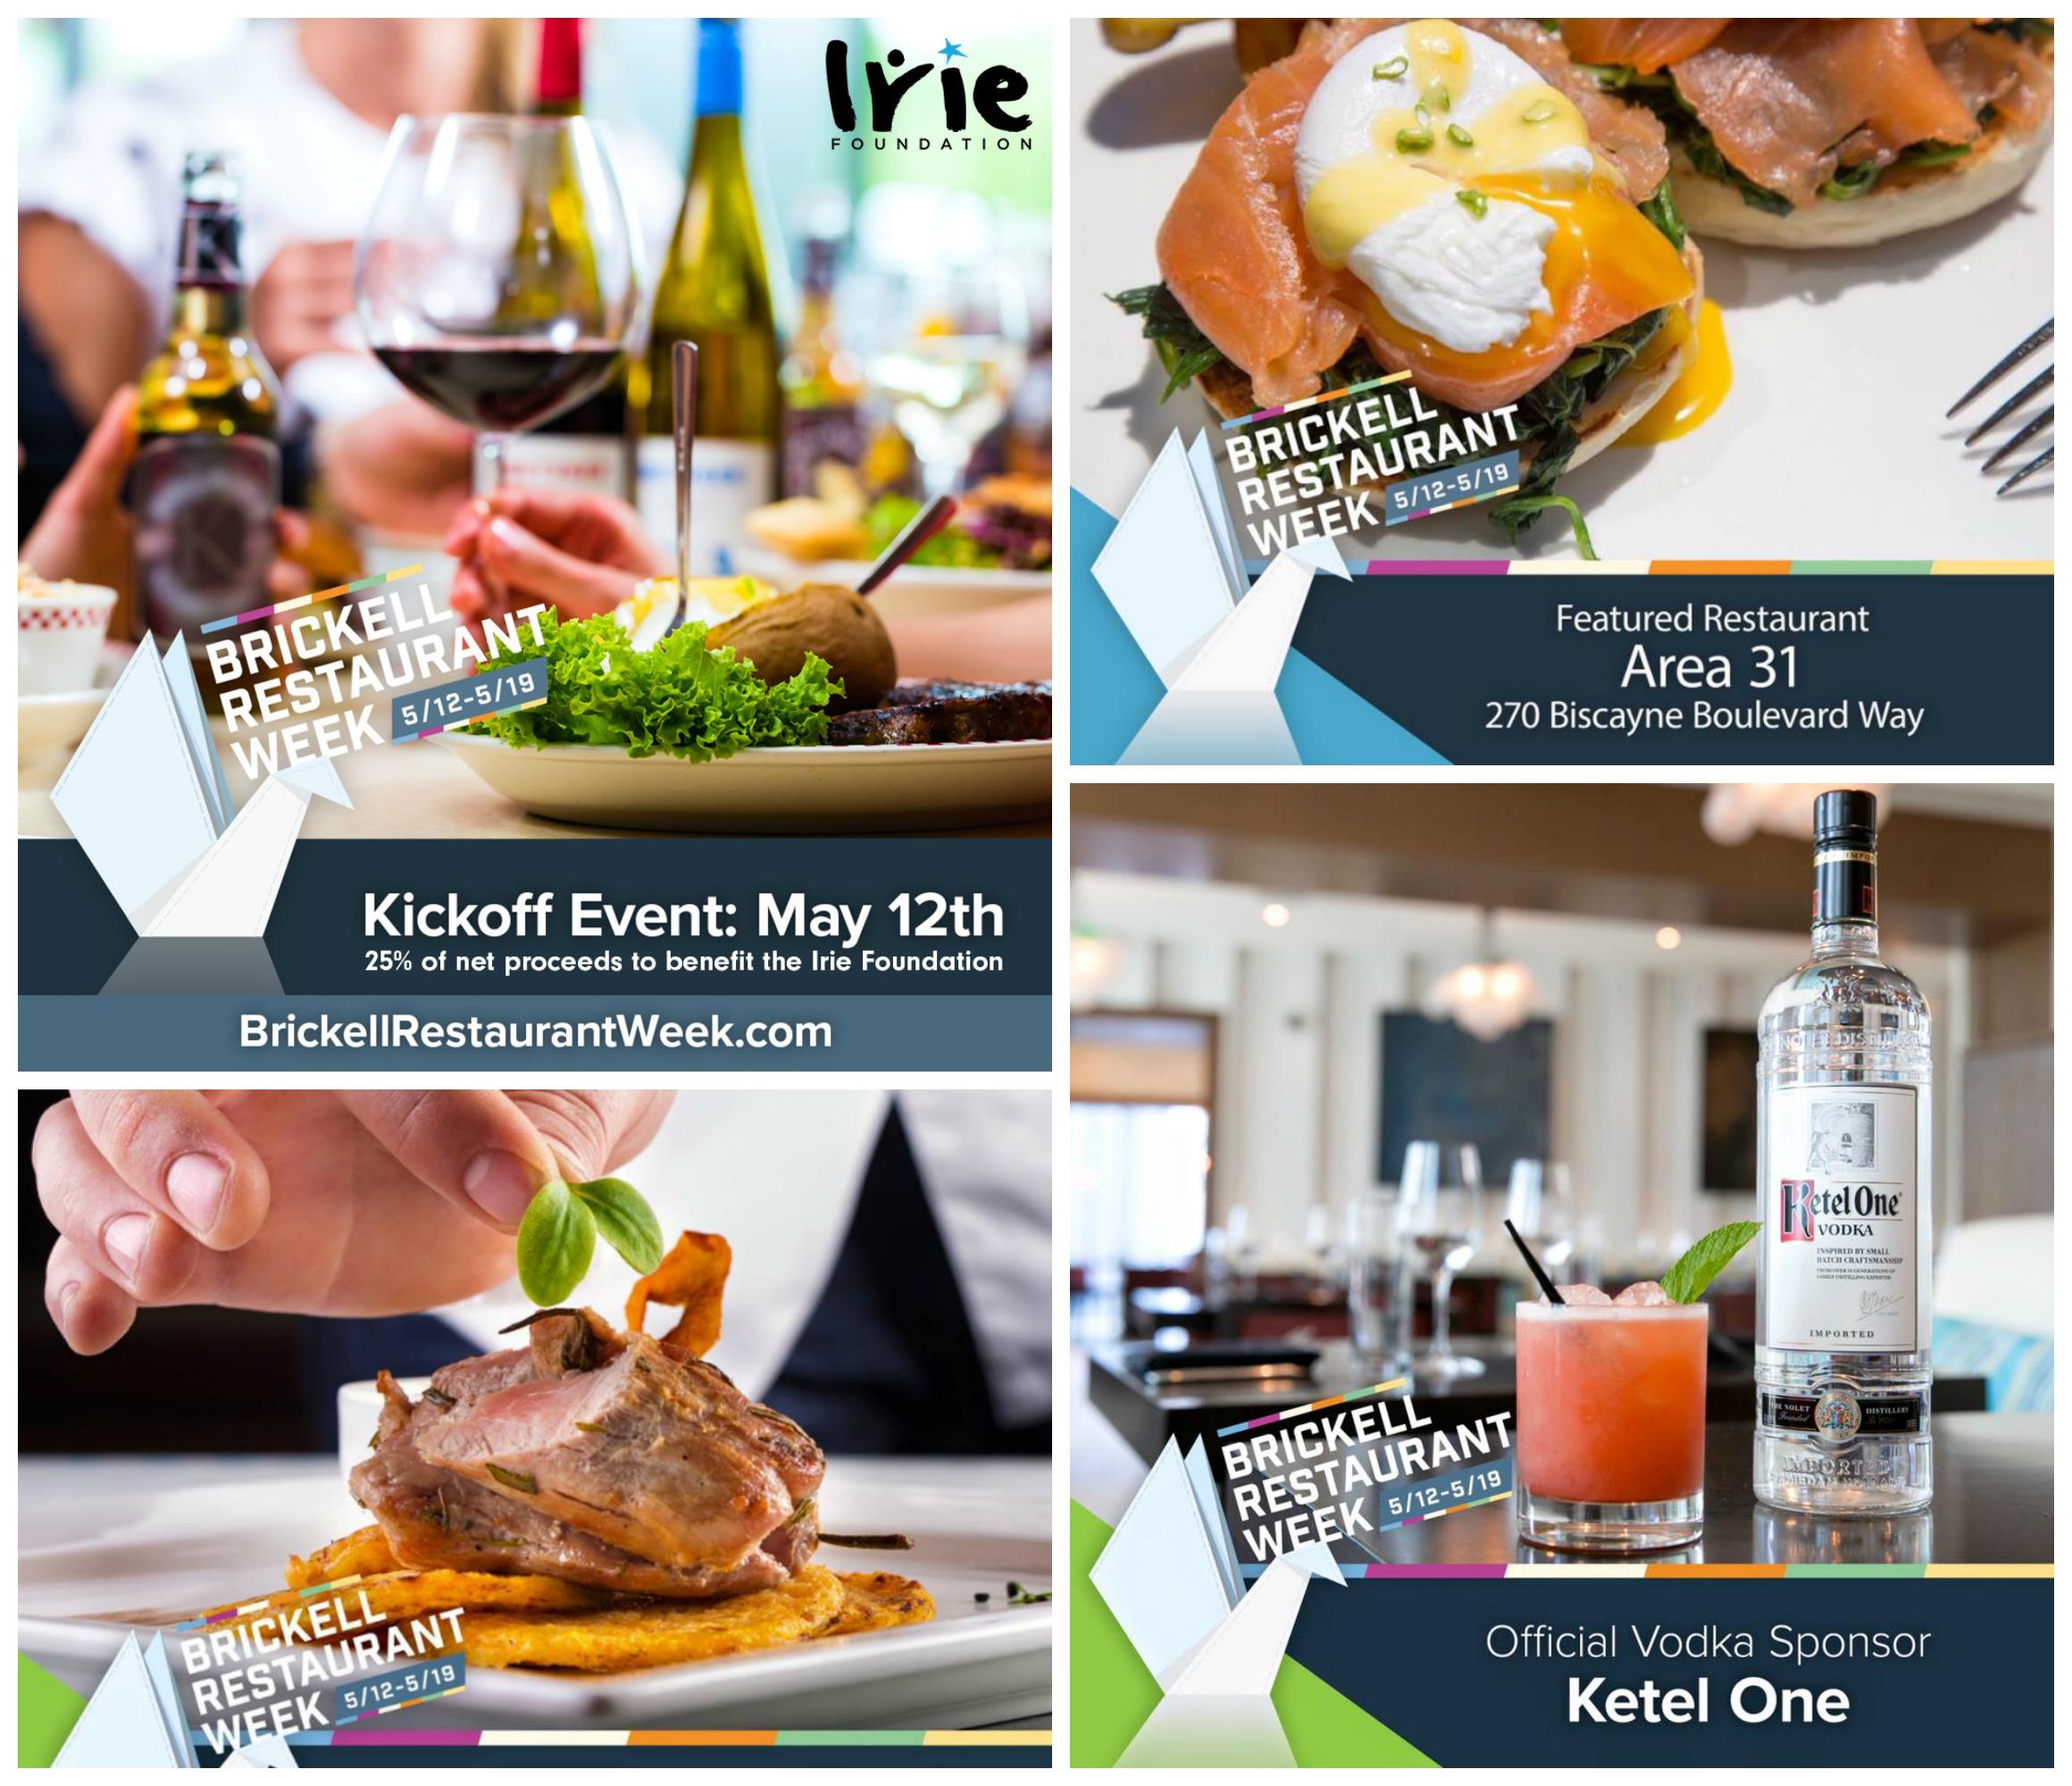 Brickell Restaurant Week and Kick off